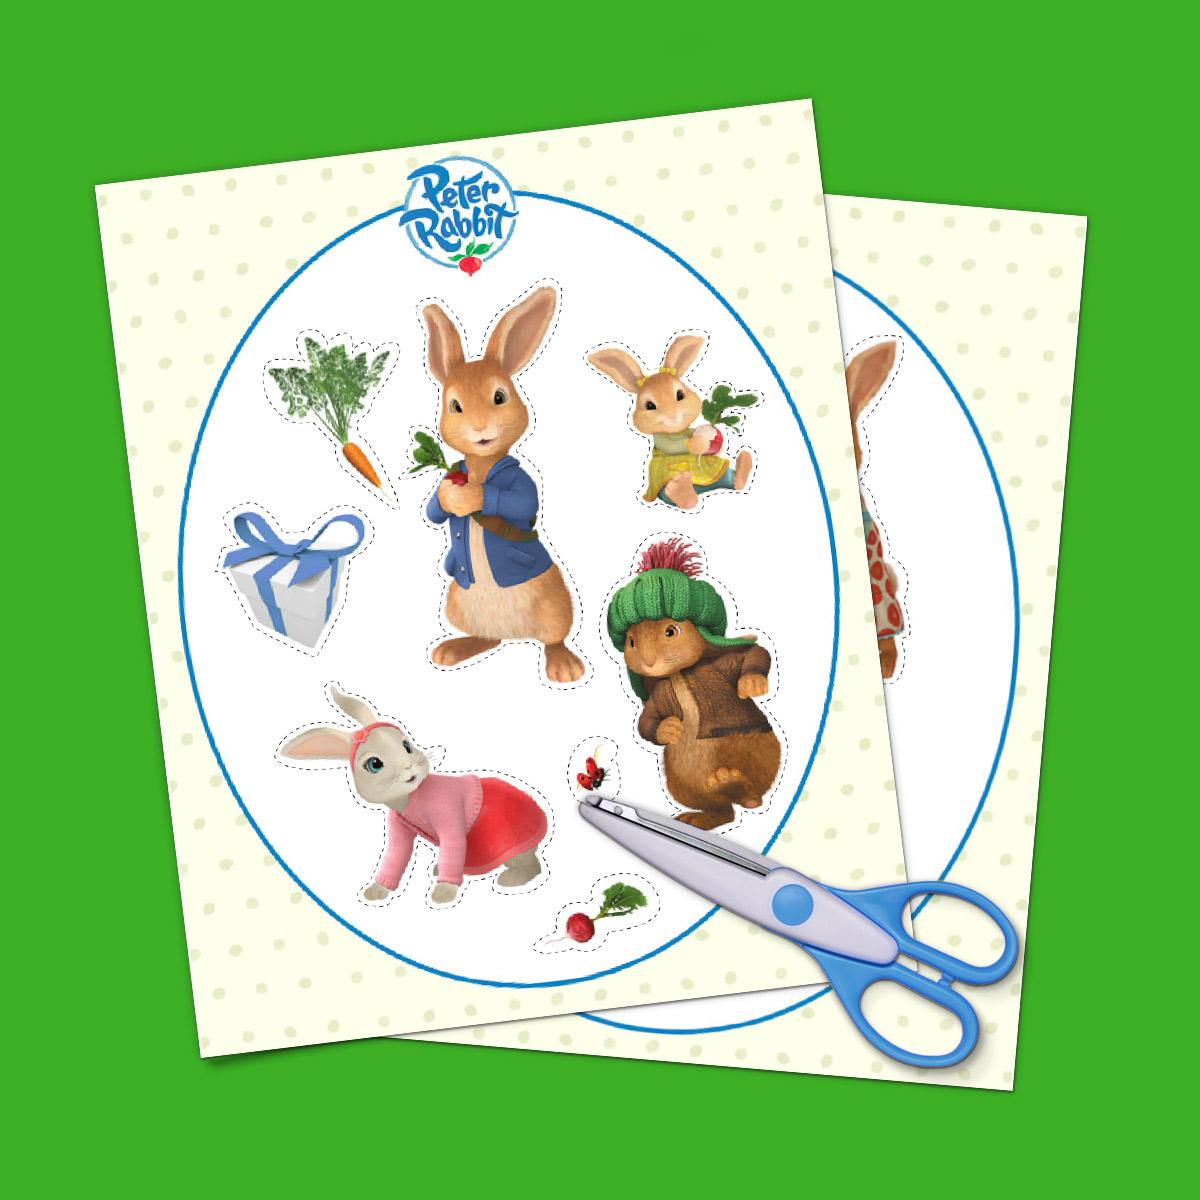 Peter Rabbit Goody Bag Stickers